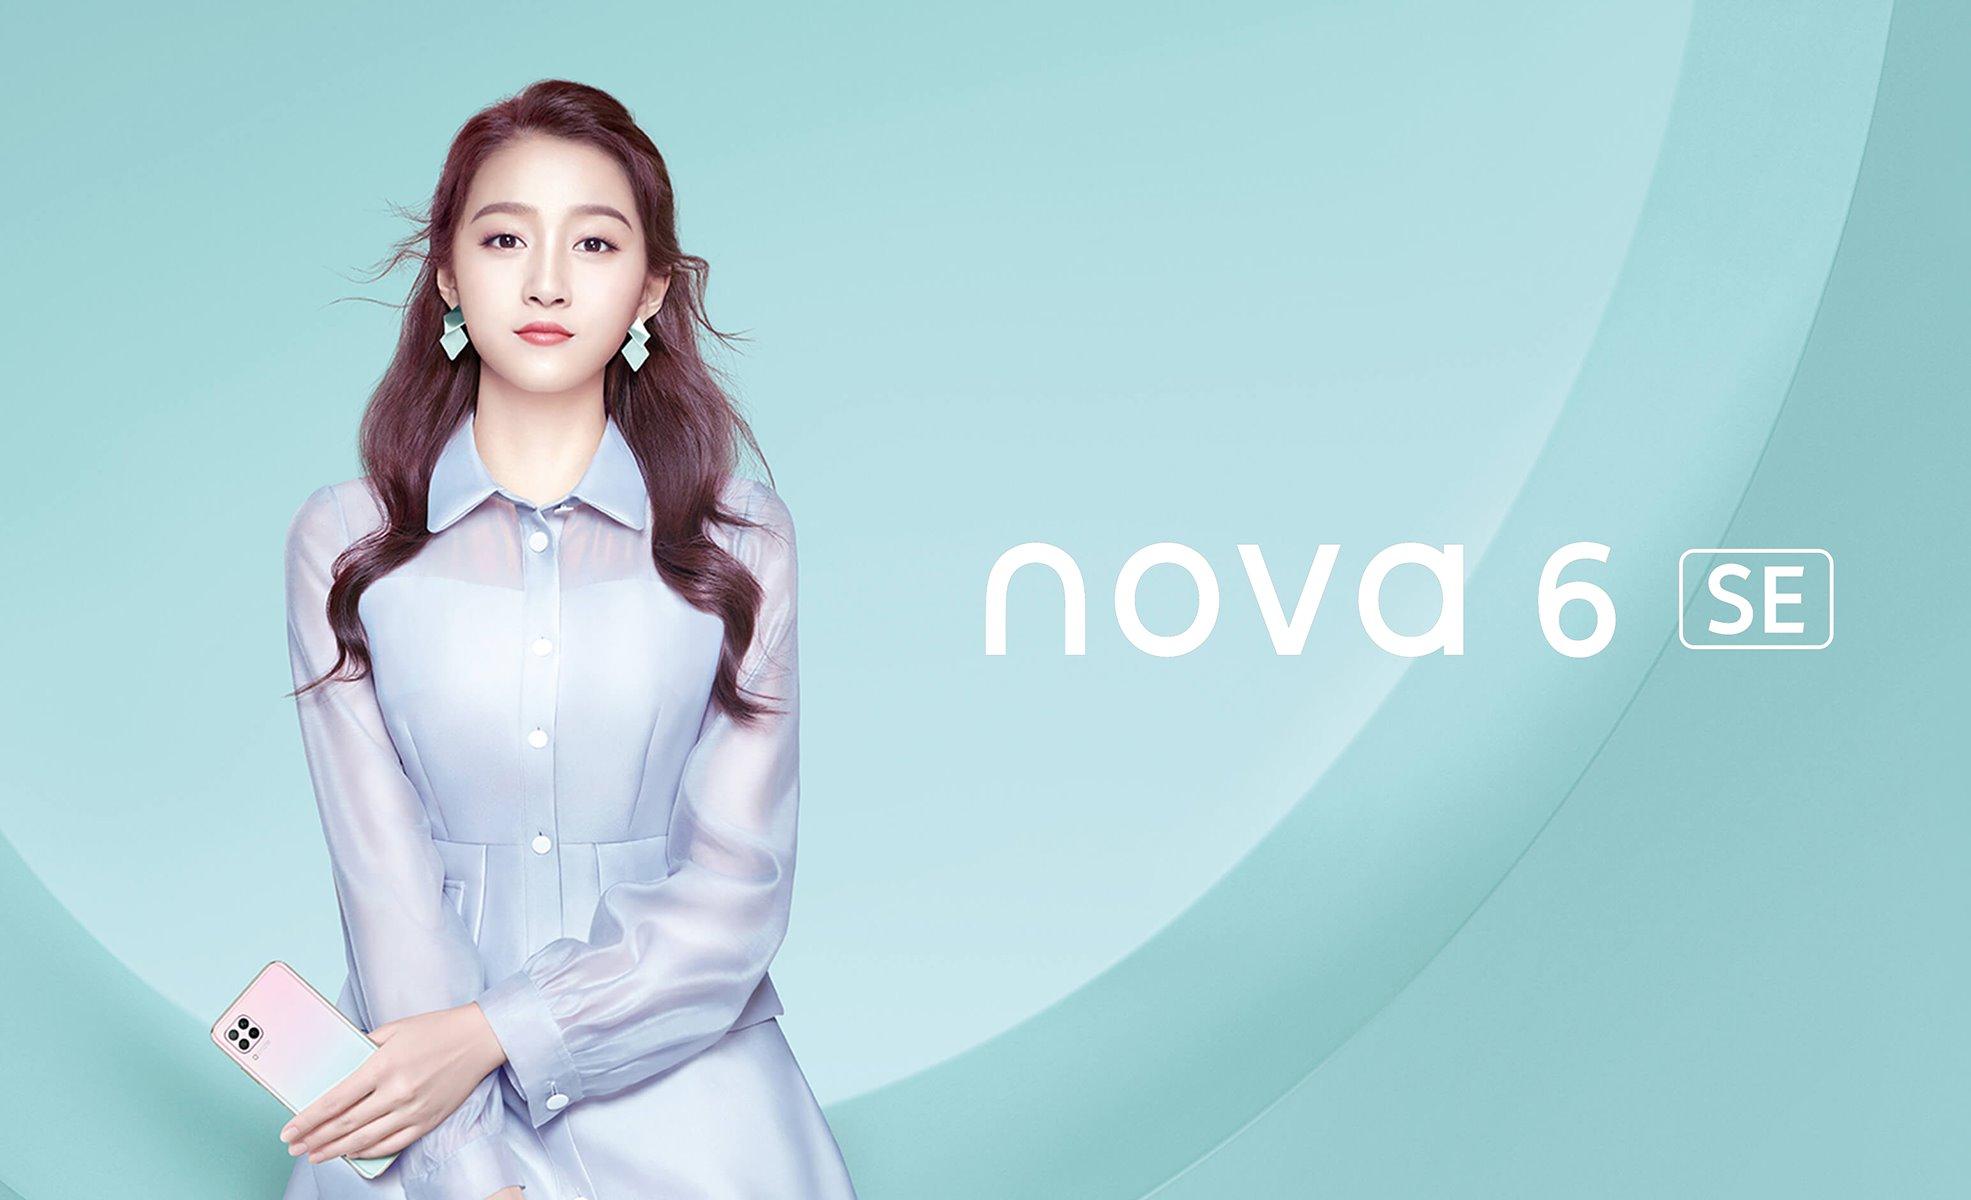 Huawei nova 6 SE Screen